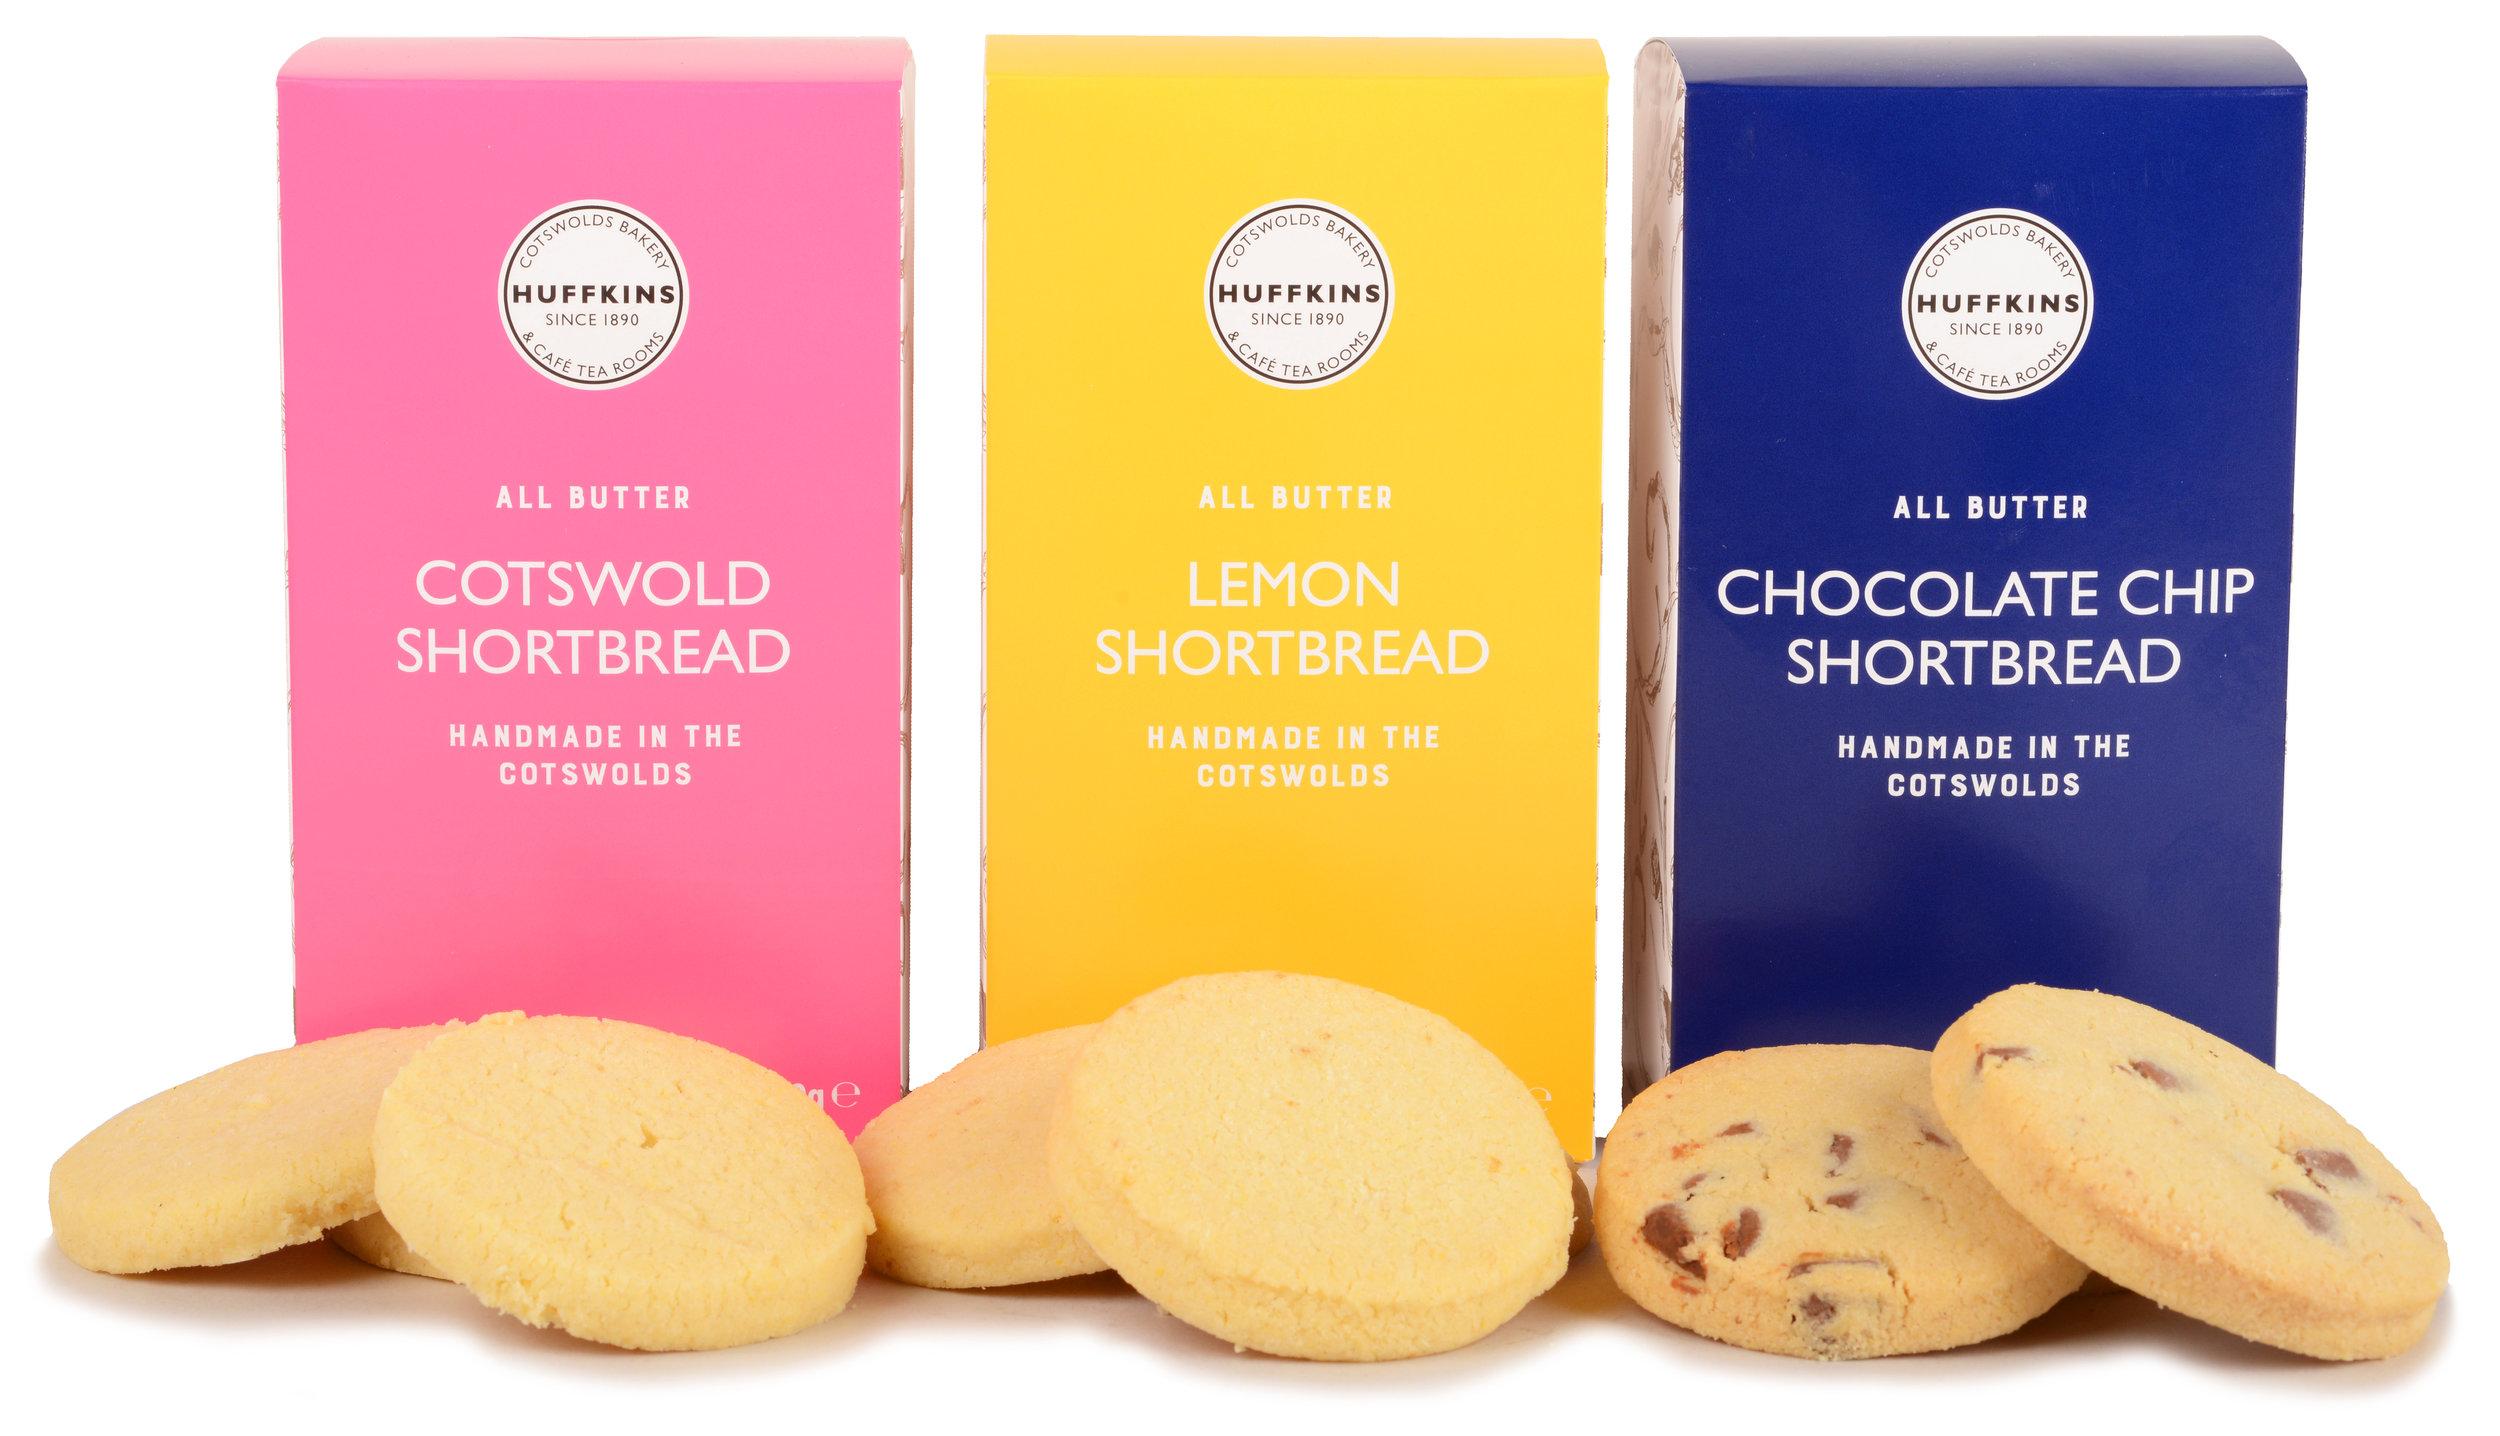 Everyday biscuits - enjoy life's simple pleasures